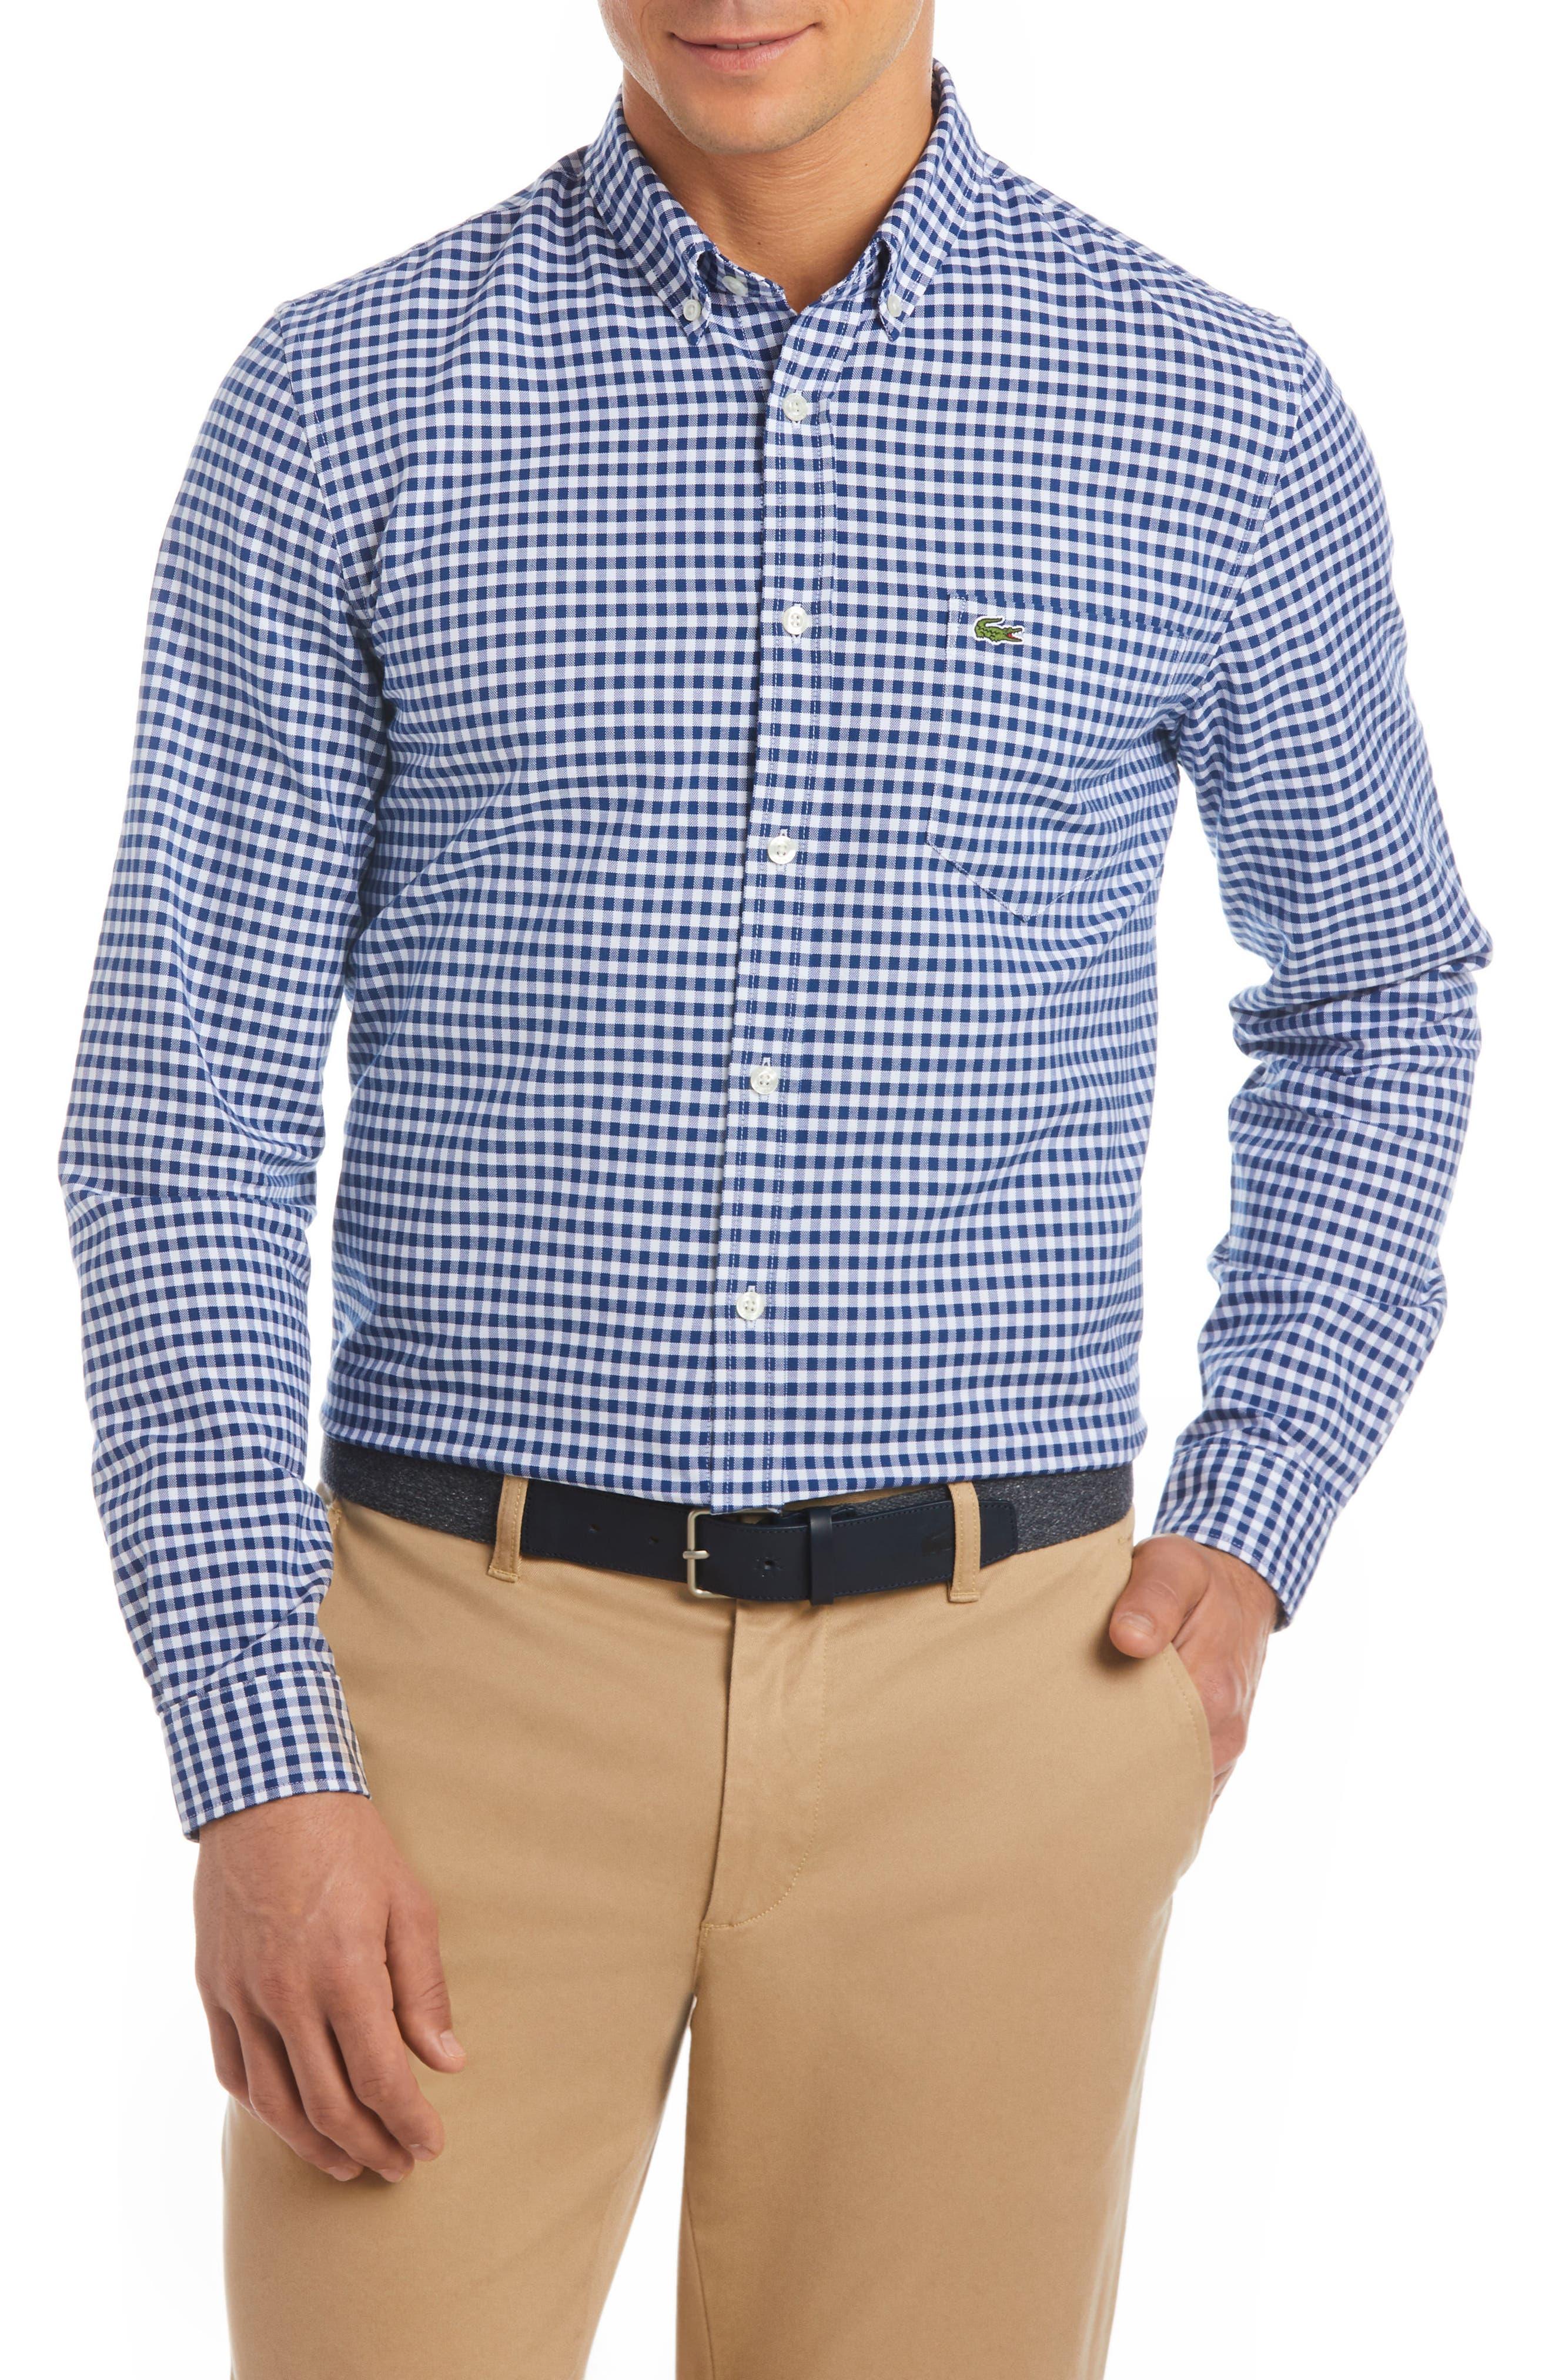 Lacoste Slim Fit Gingham Sport Shirt